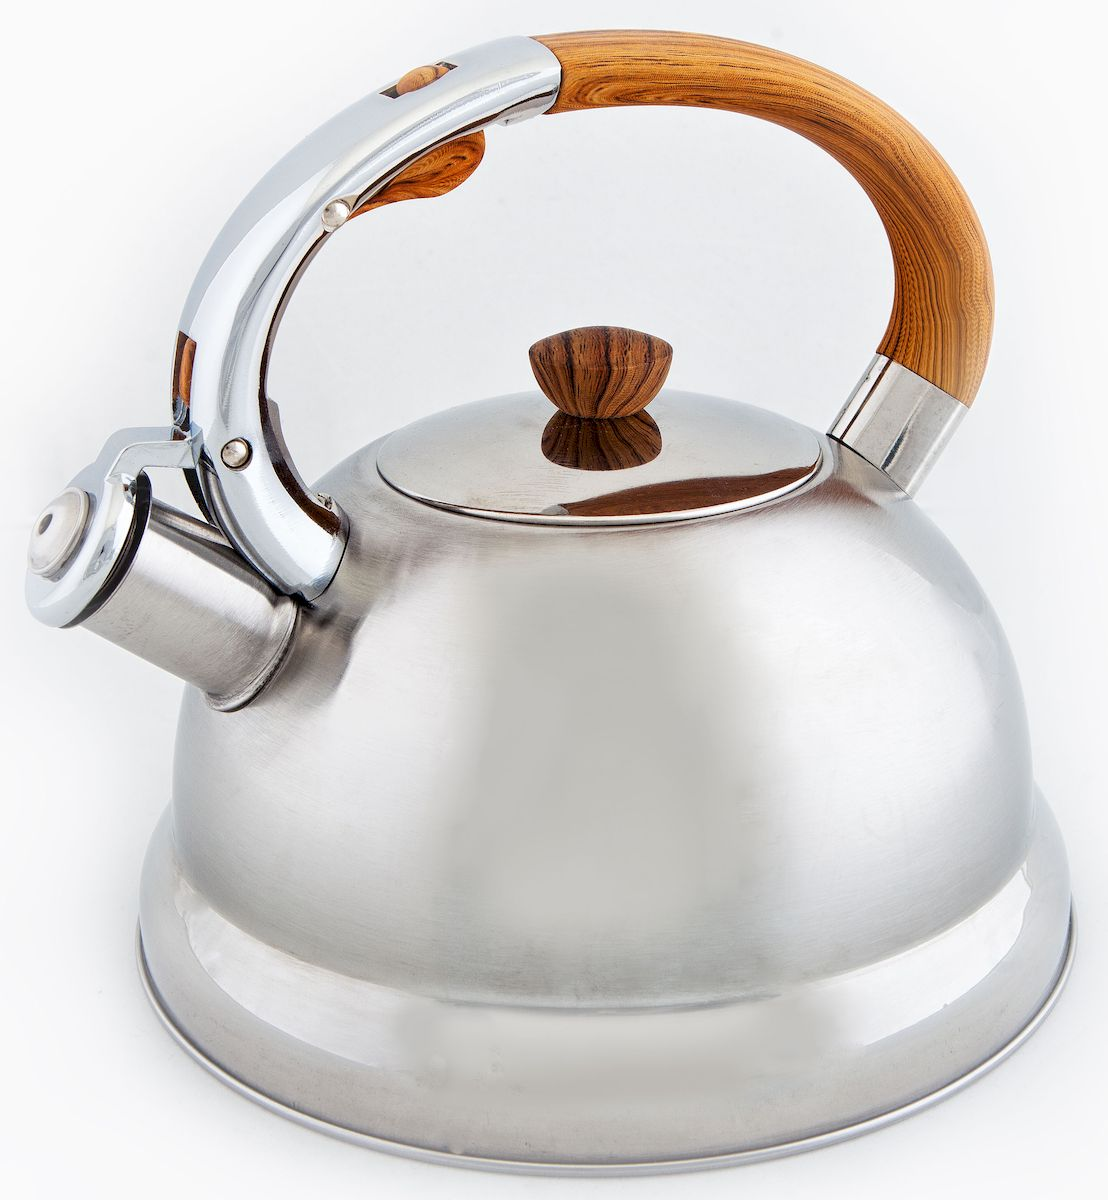 Чайник Hoffmann со свистком, 3 л. НМ 5516 чайник hoffmann со свистком цвет бежевый 2 л hm 5528 1